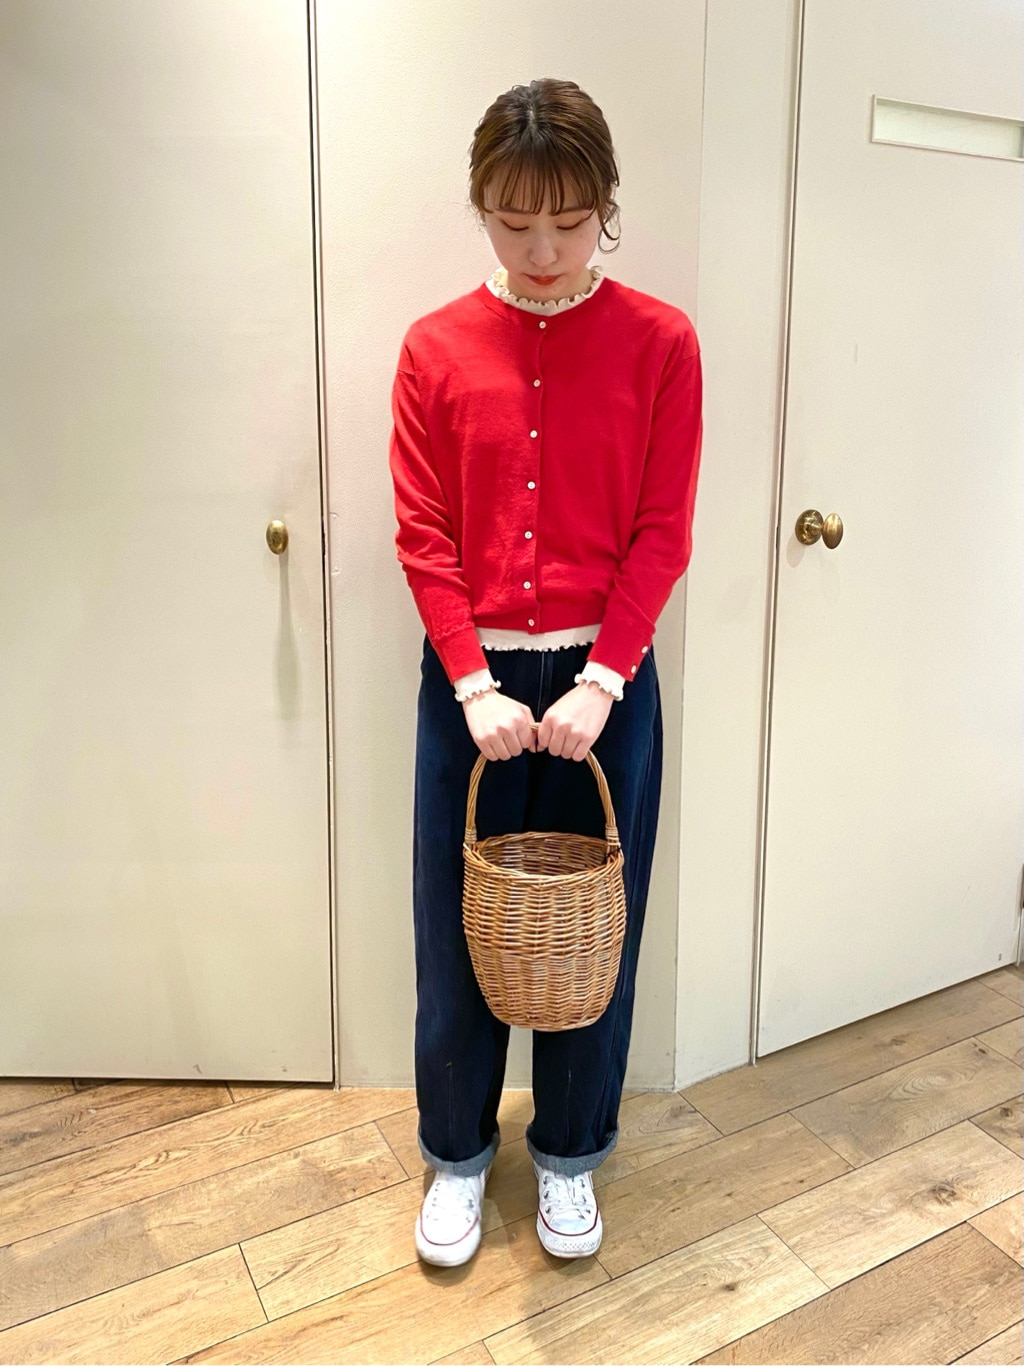 bulle de savon 新宿ミロード 身長:157cm 2021.02.13